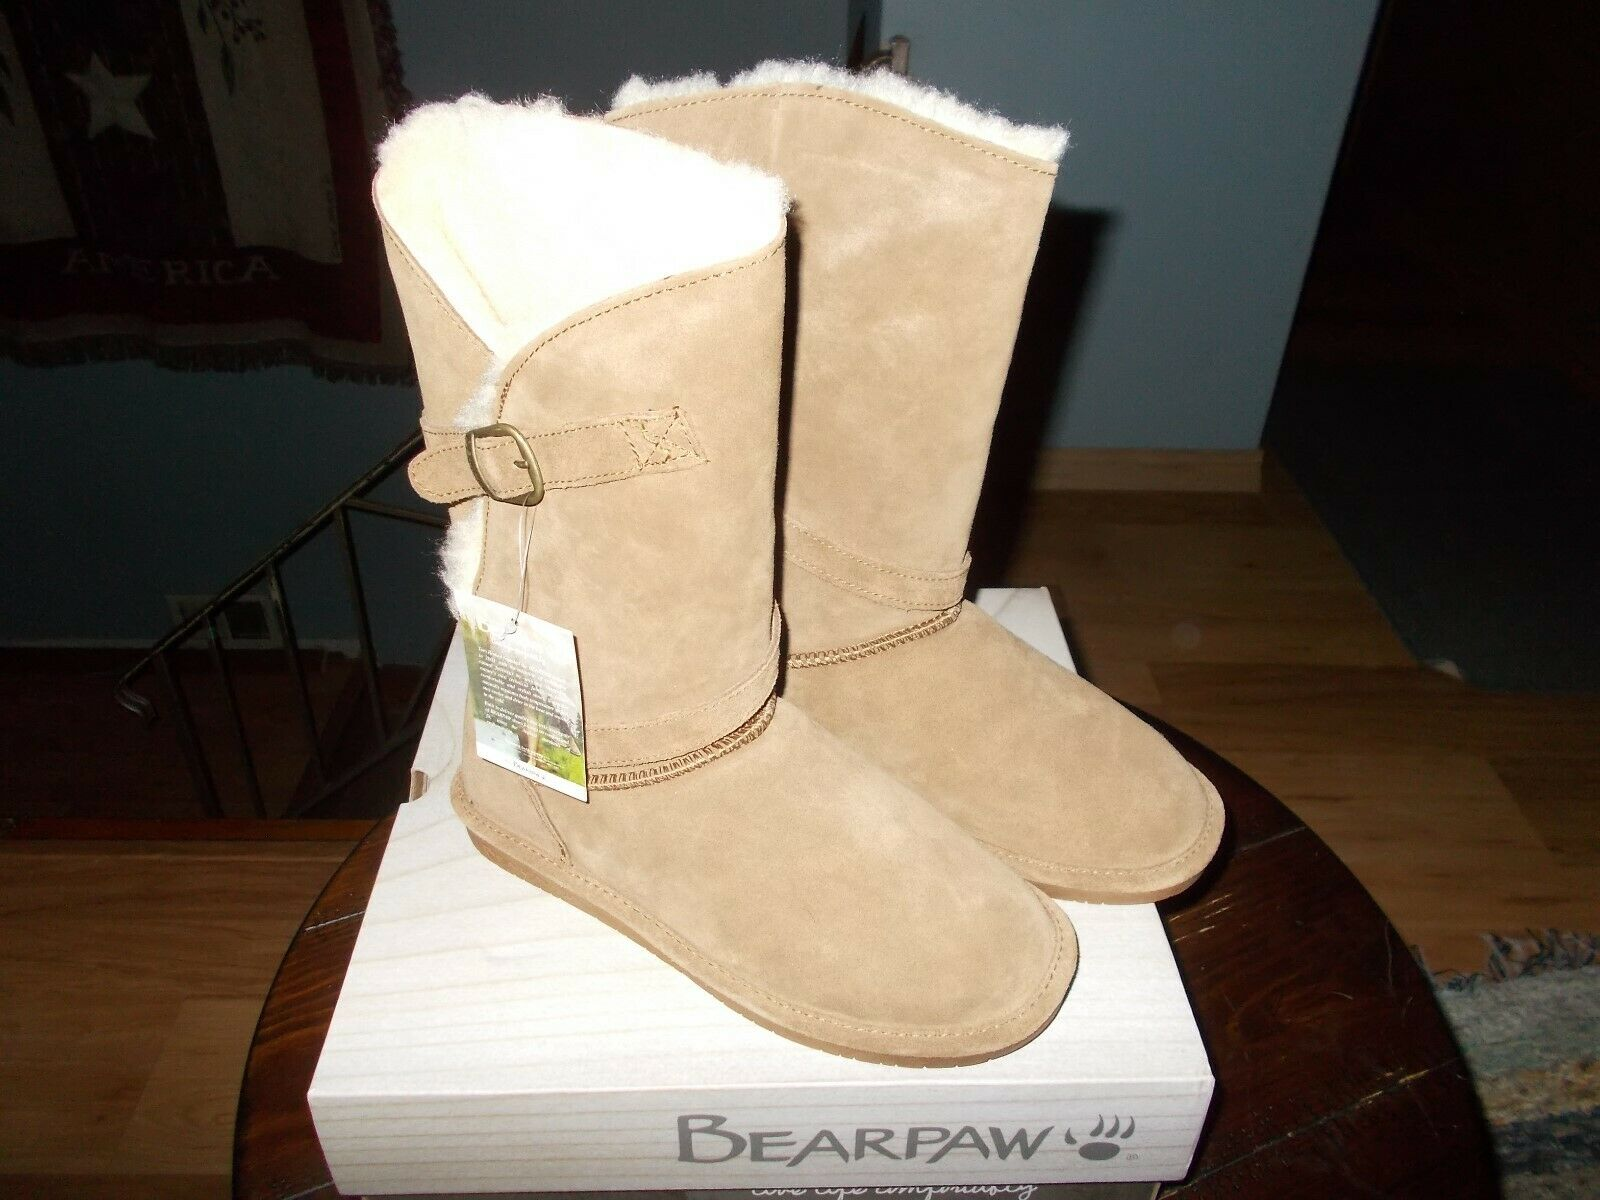 Bearpaw Tatum Women's Suede Sheepskin Fur Lined Mid-Calf Boots SIZE 8